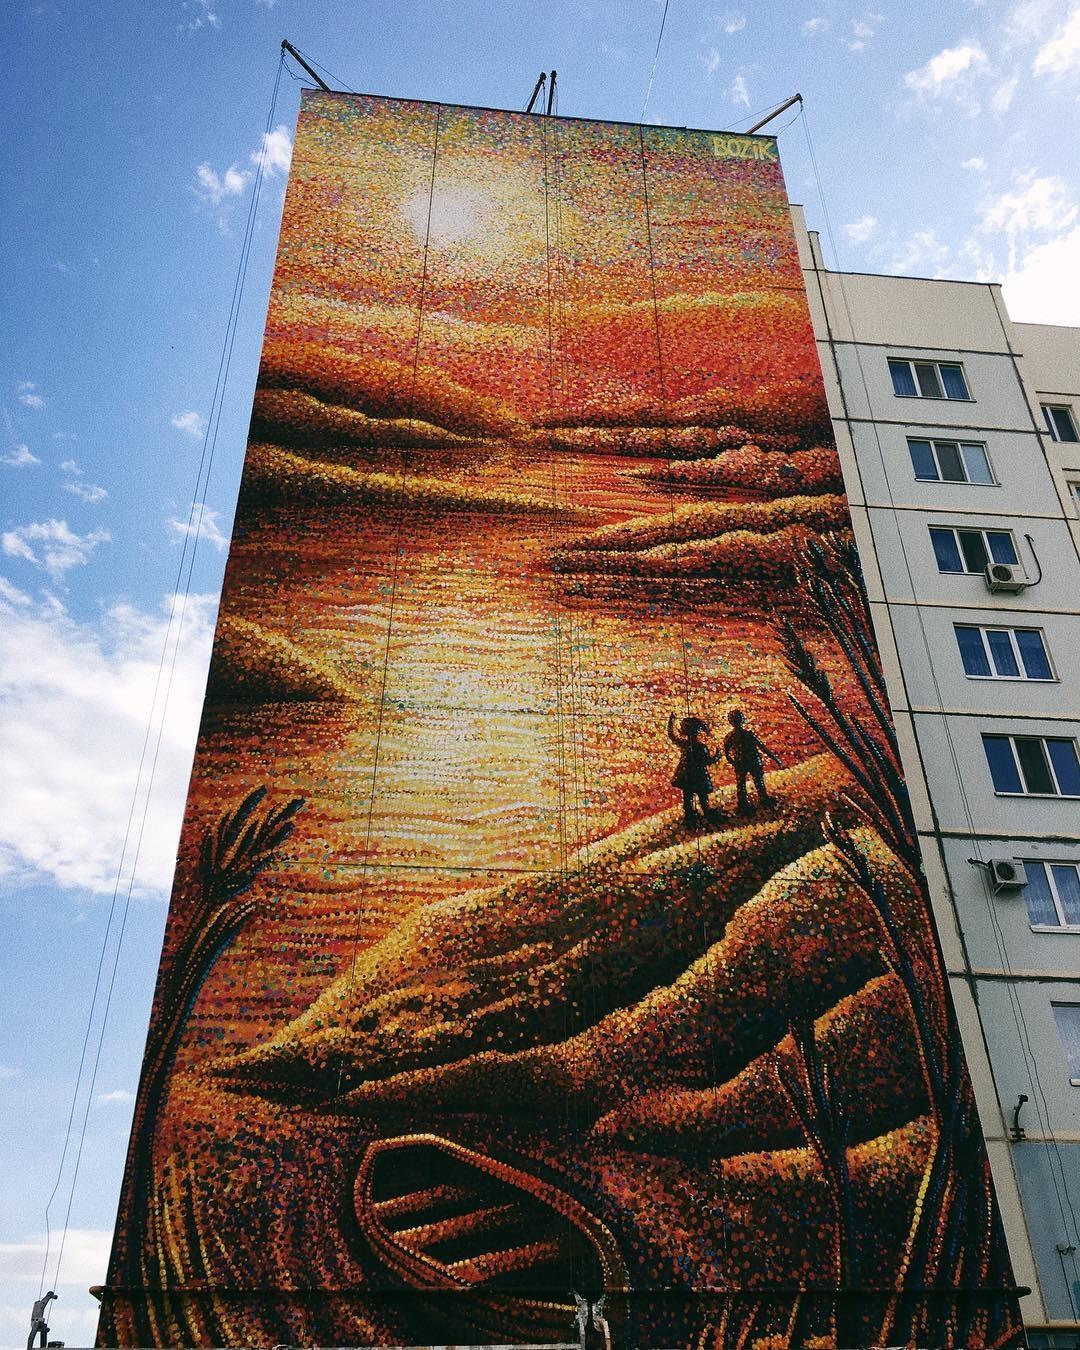 Bozik @Almetyevsk, Russia